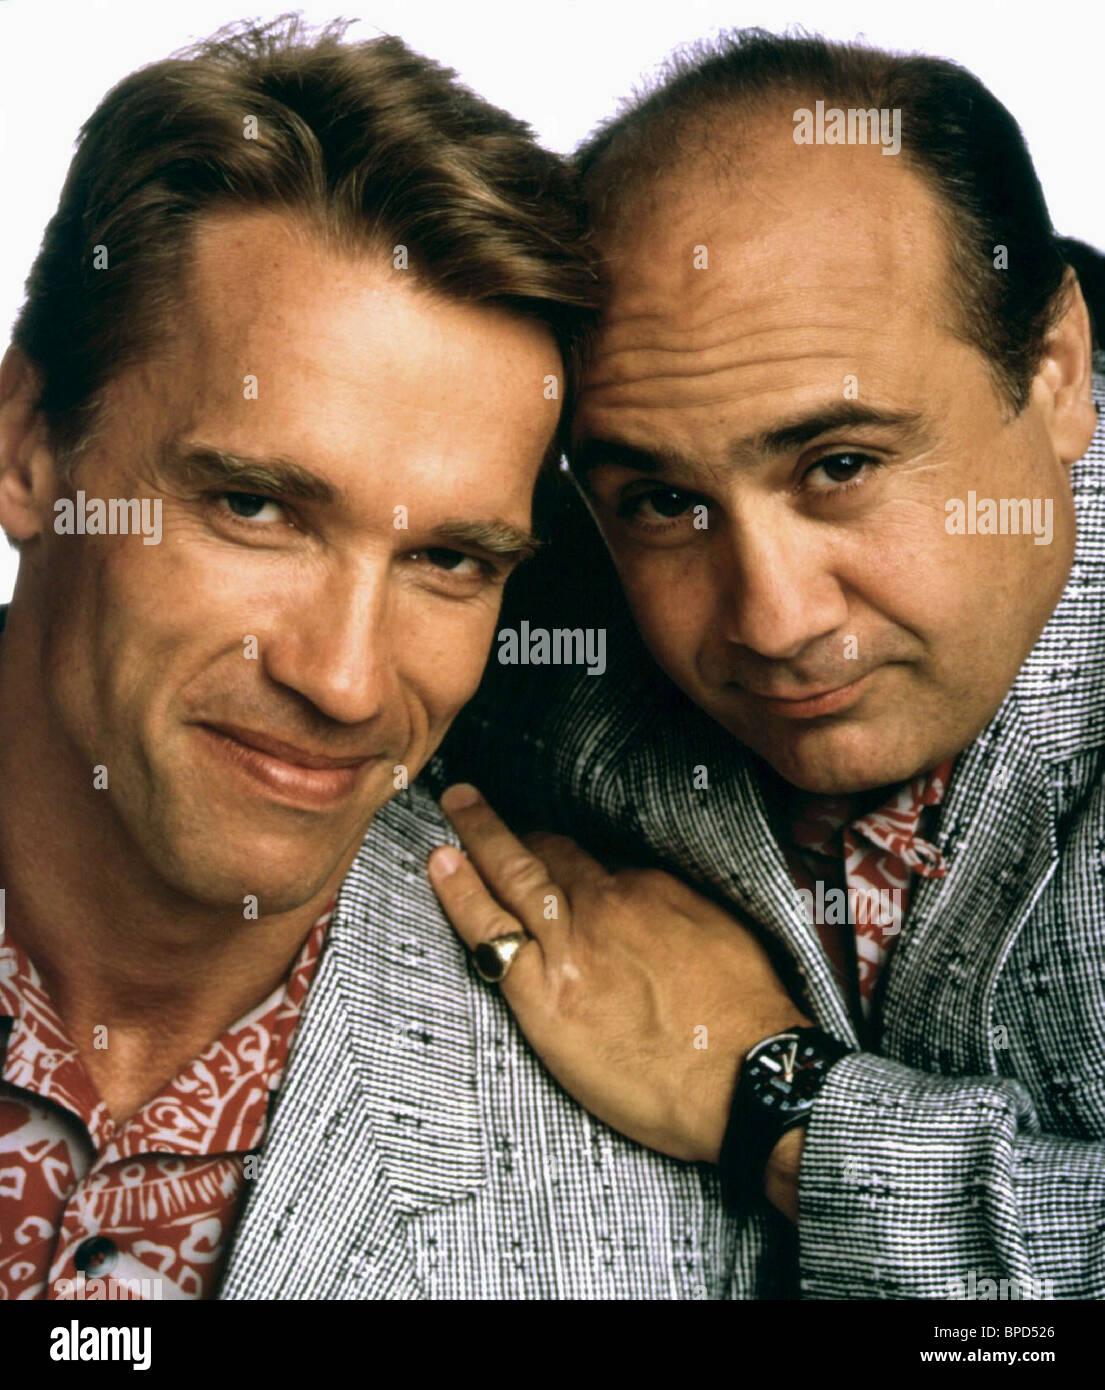 Arnold Schwarzenegger Danny Devito Twins 1988 Stock Photo Alamy